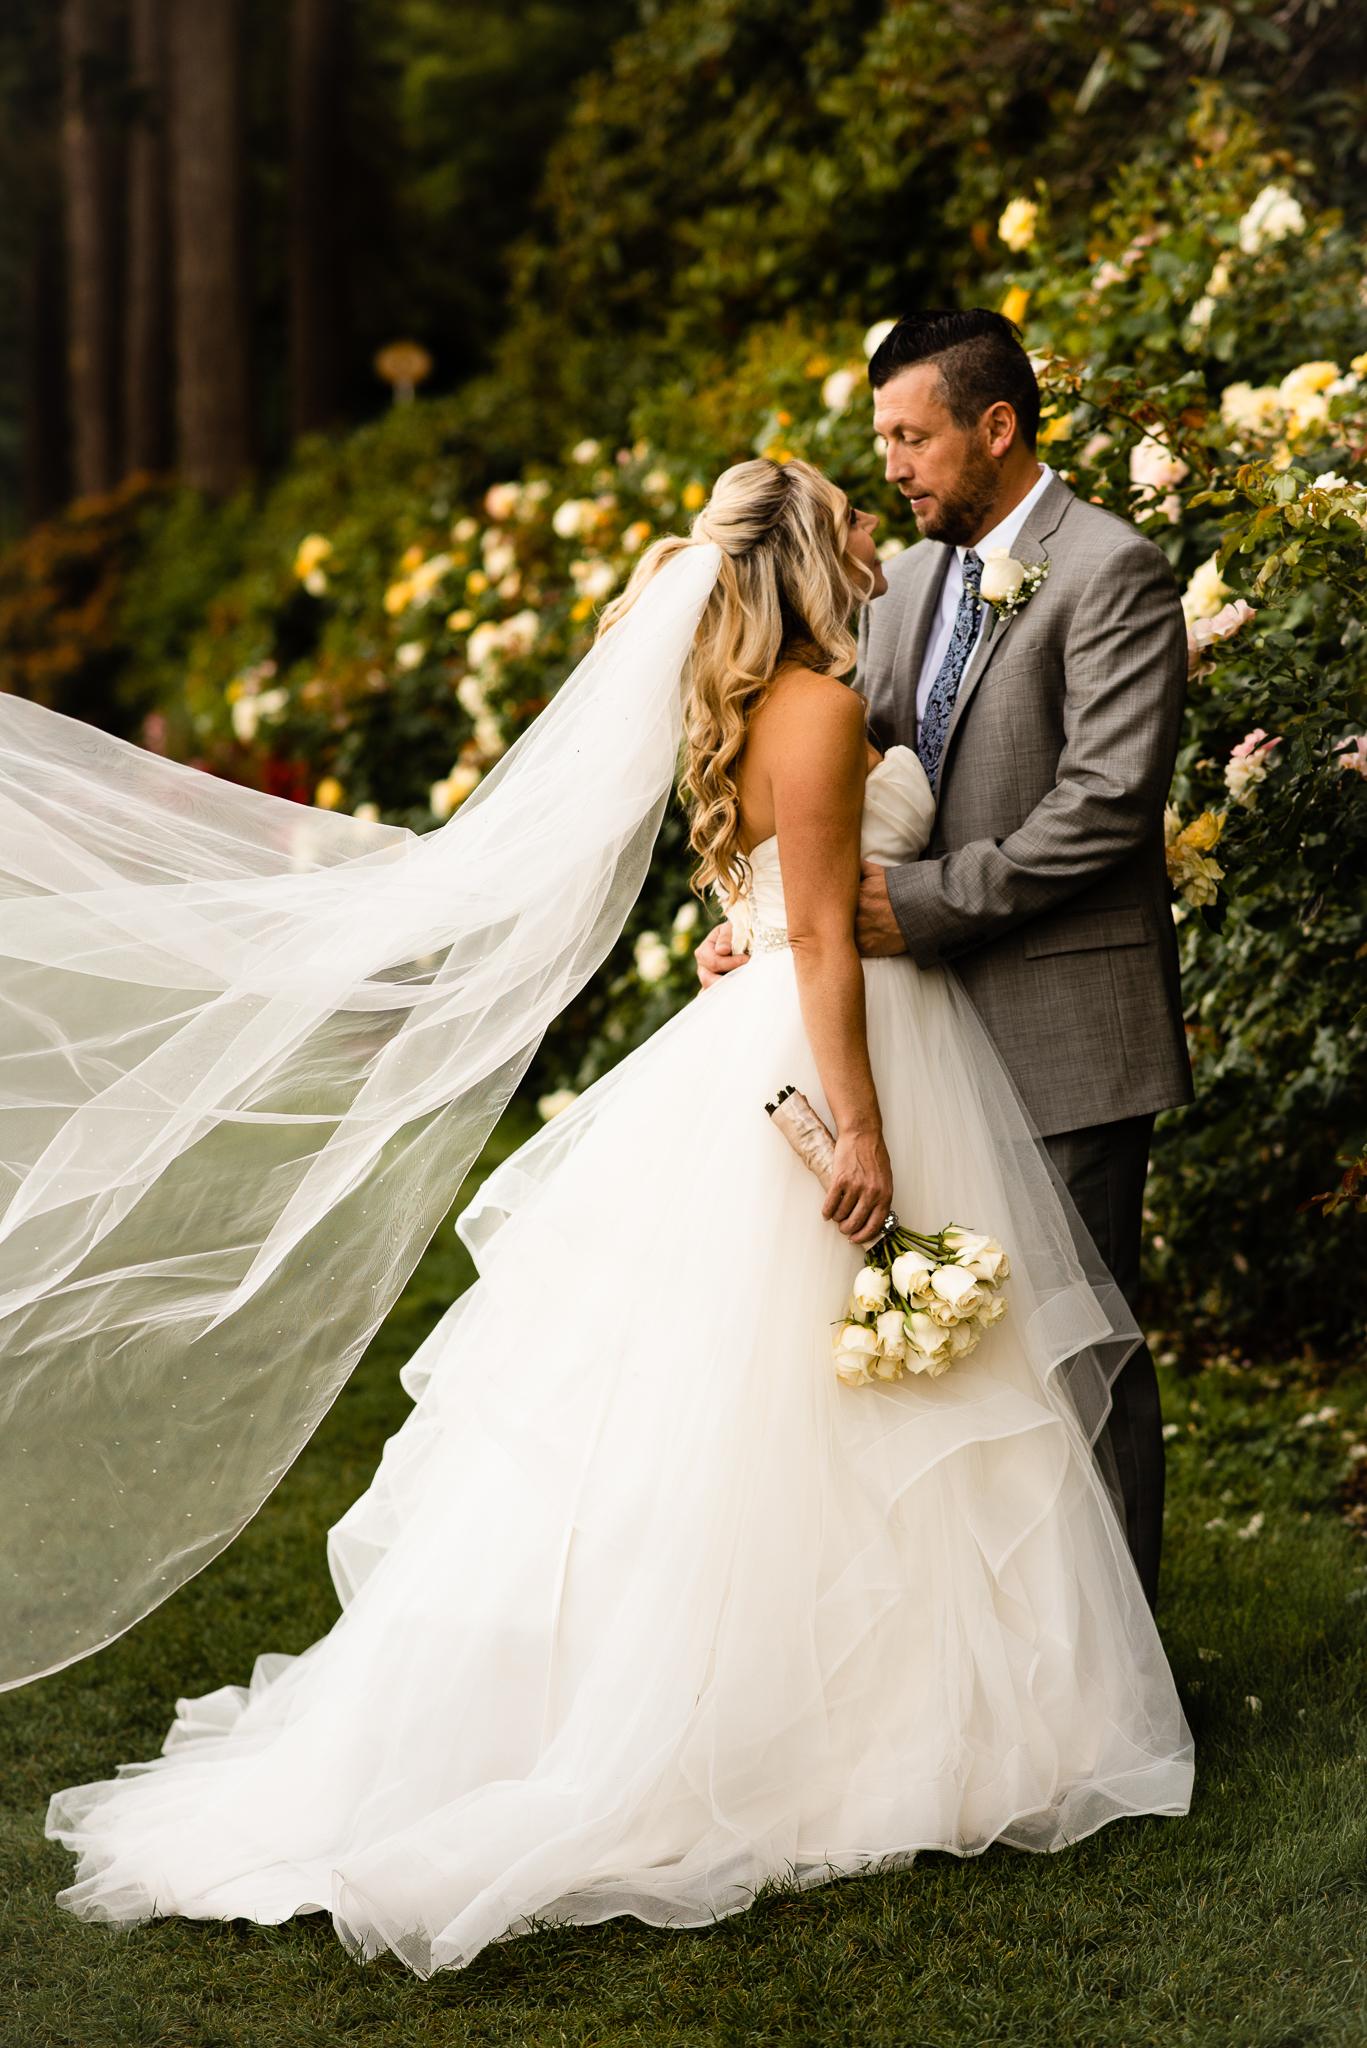 Megan & Keith - Wedding - Portland OR - Malina Rose Photography-8.jpg